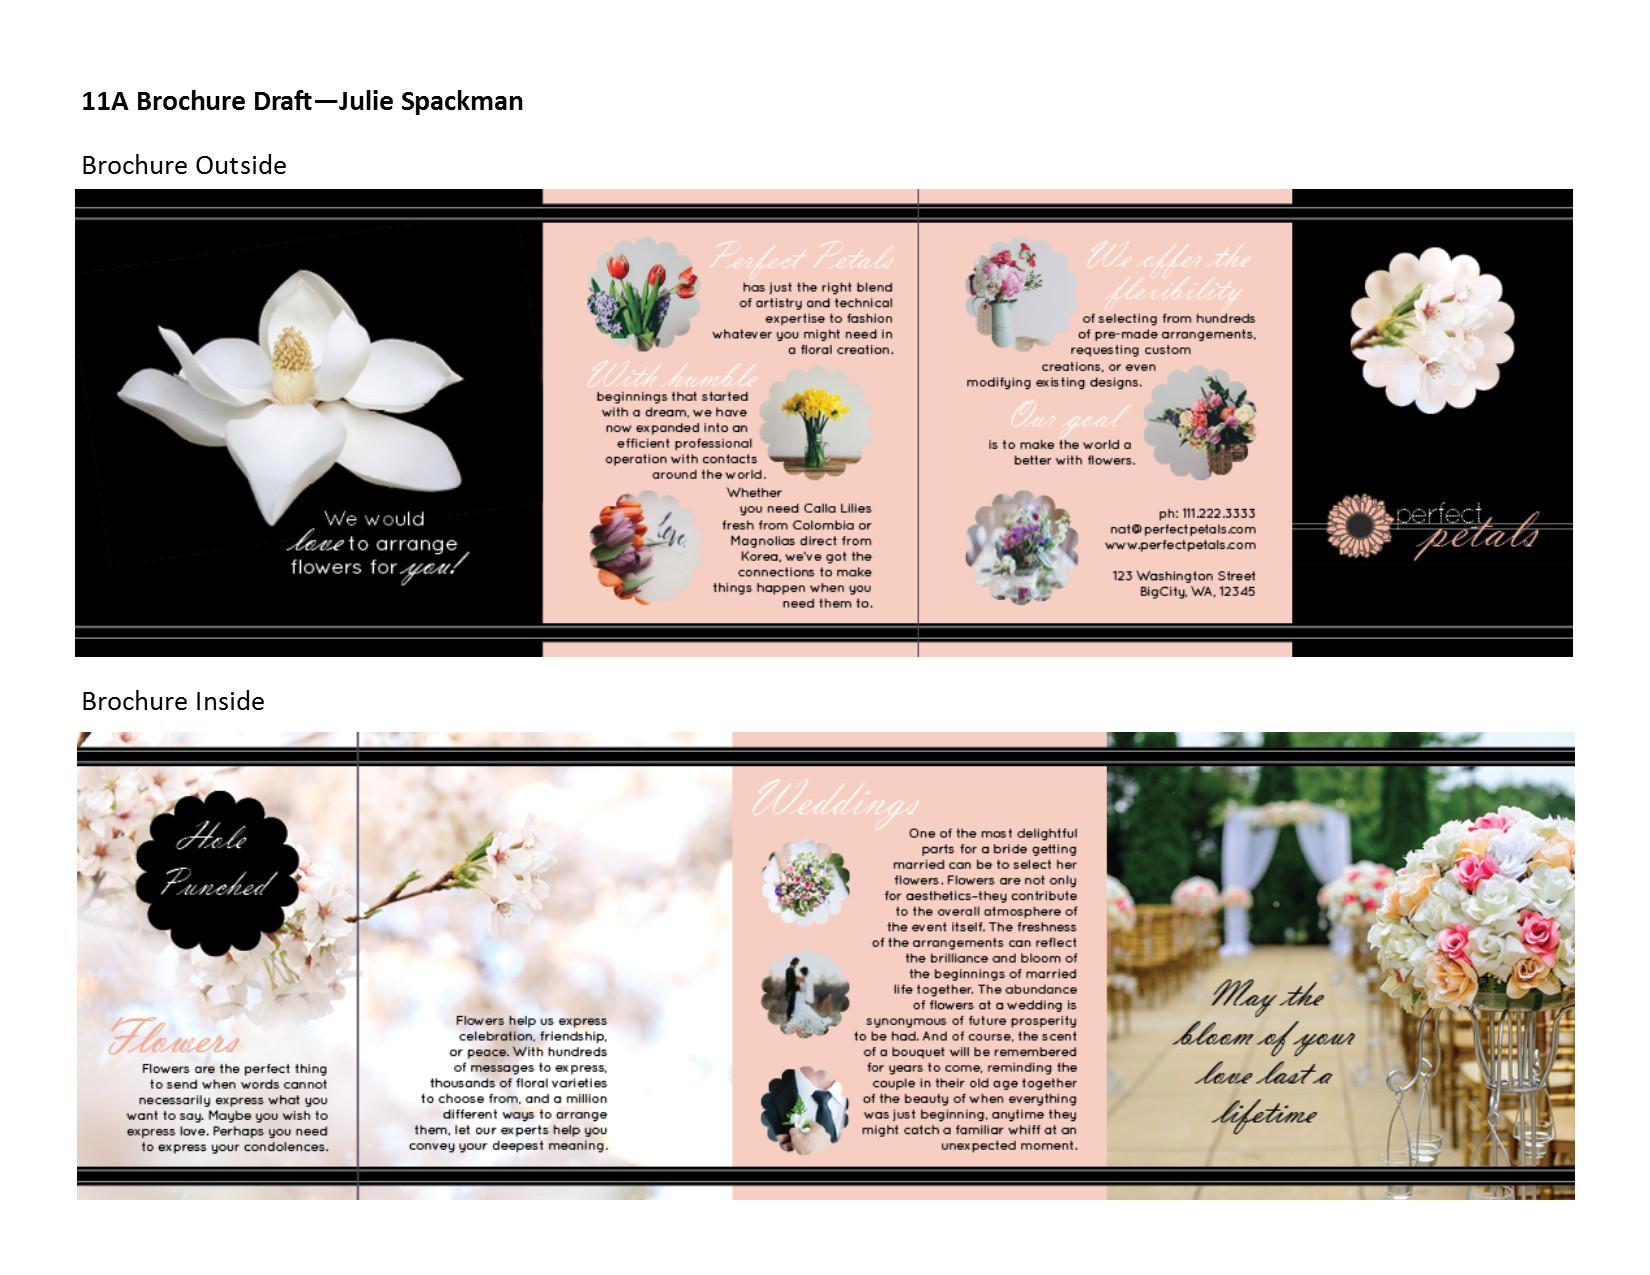 Best Way to Send Flowers Online Beautiful Js Visual Media